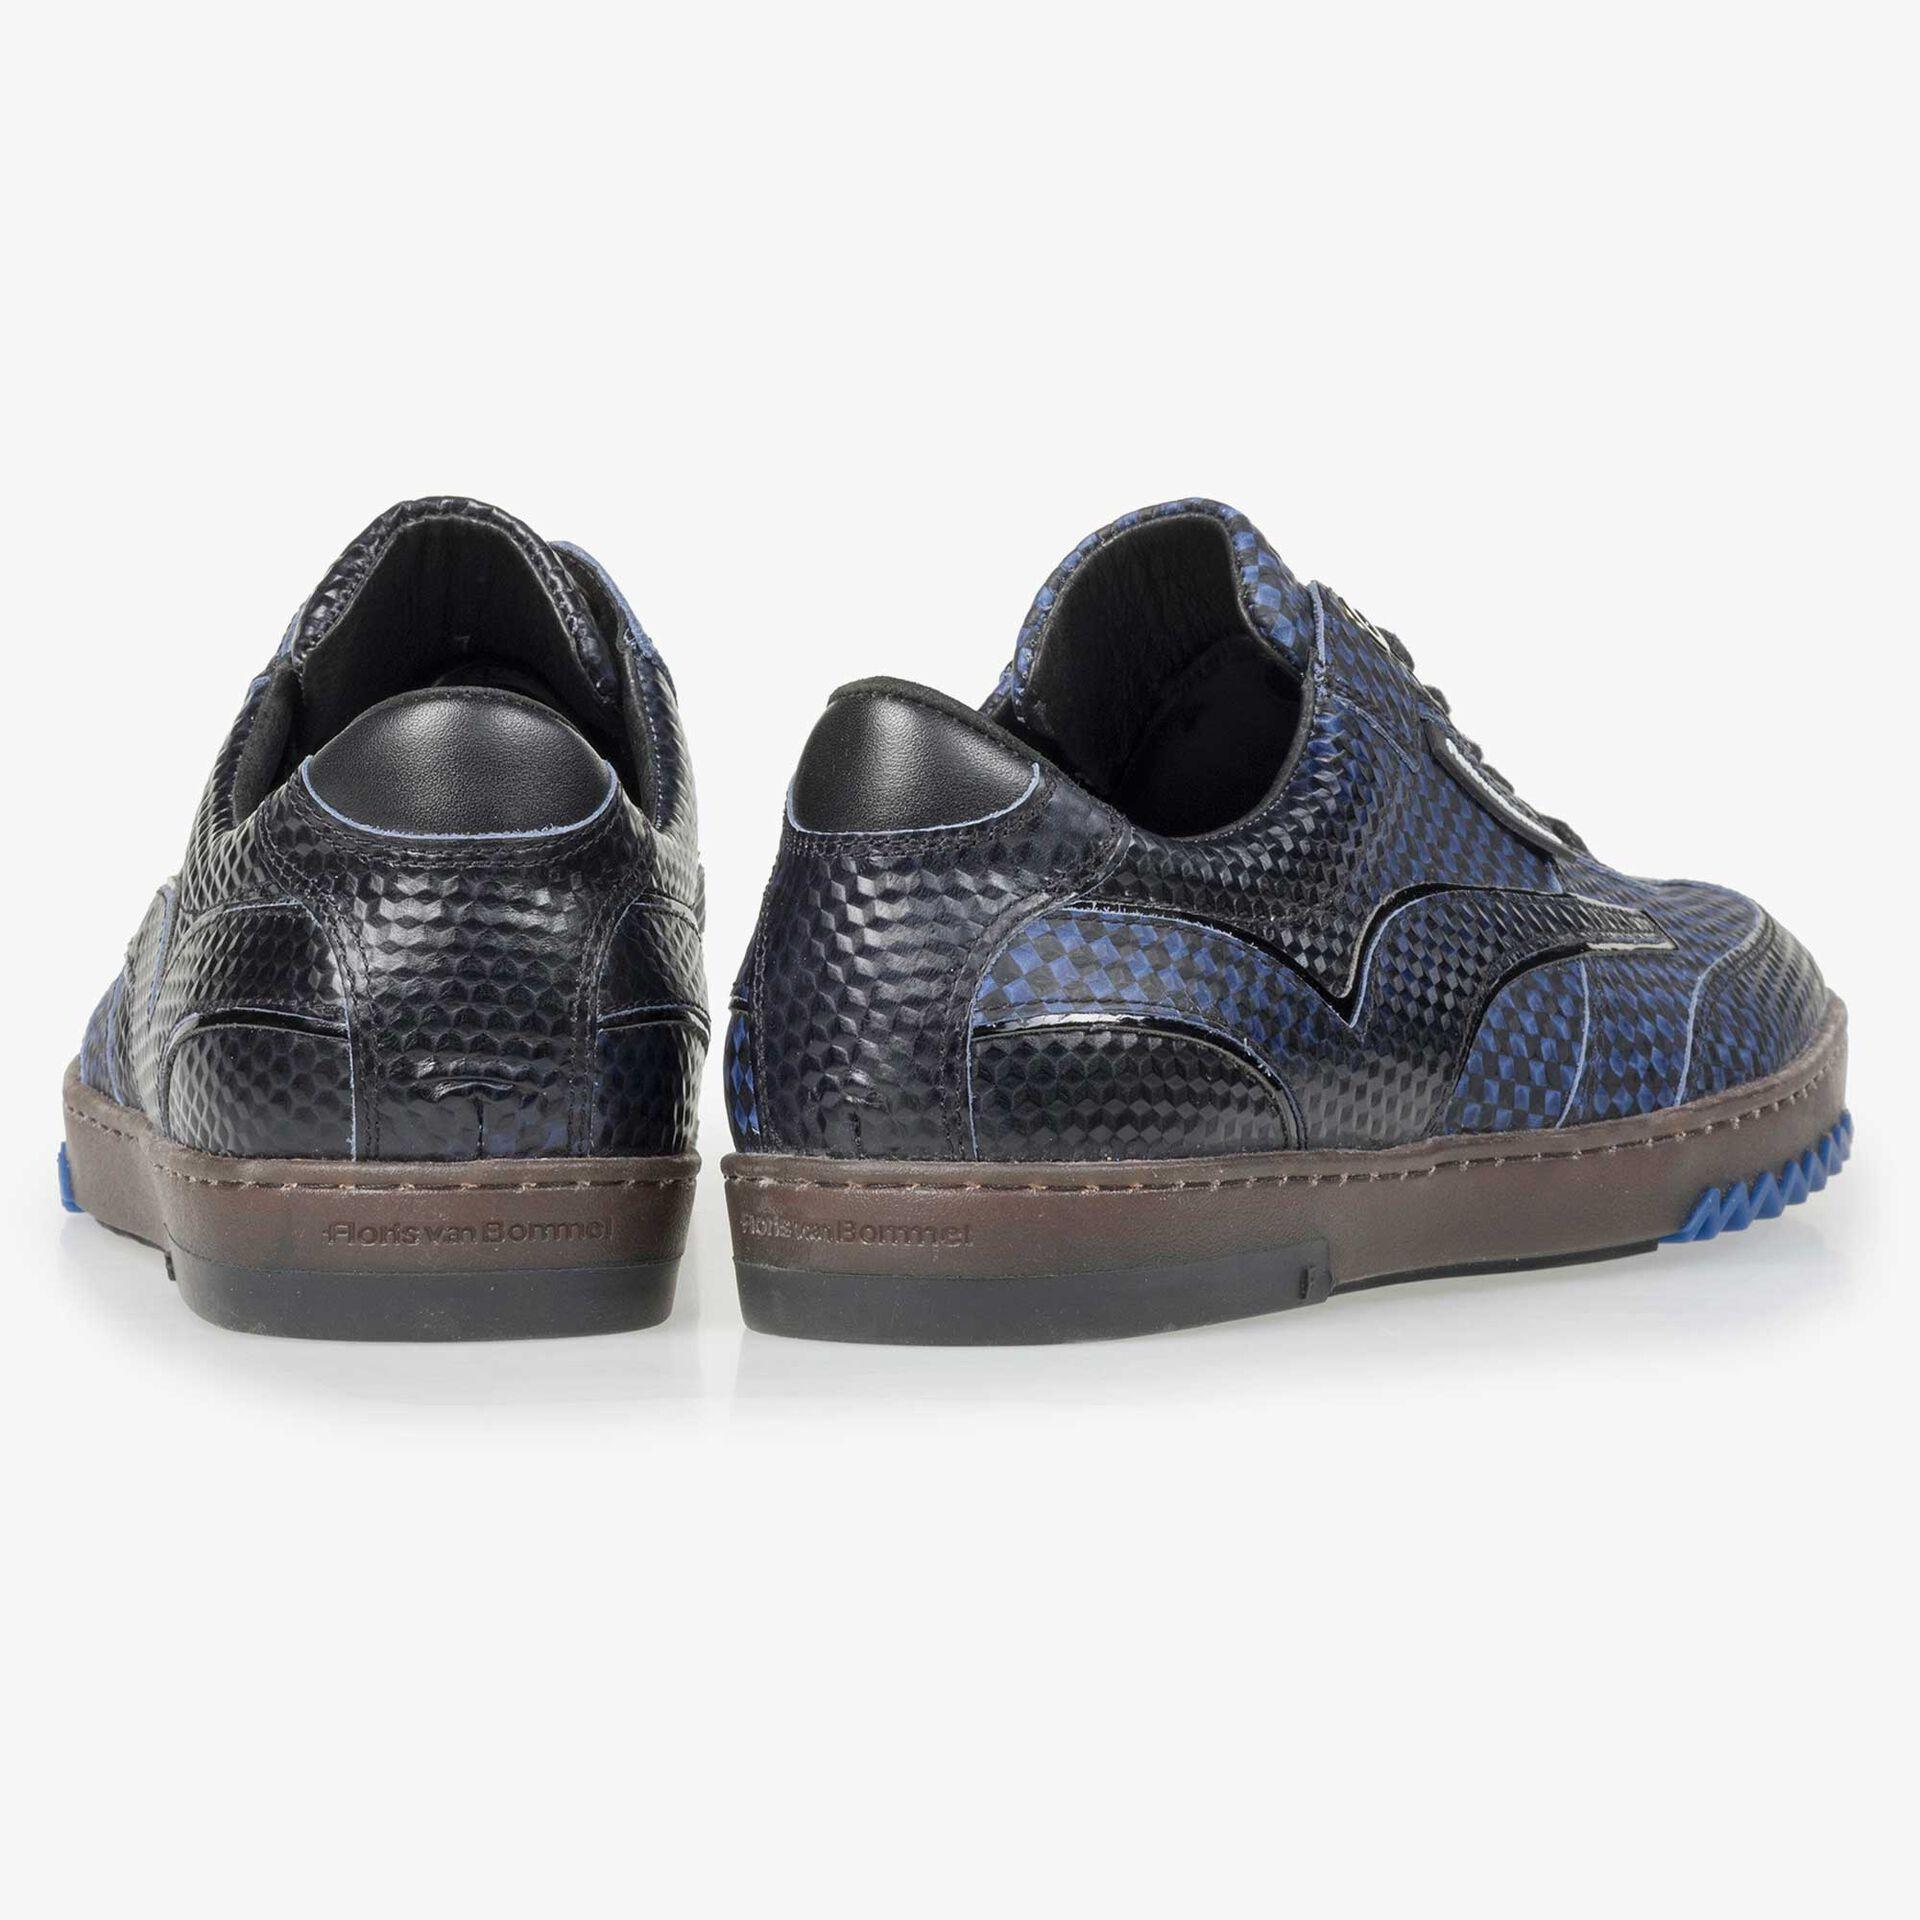 Floris van Bommel men's dark blue sneaker finished with a black print